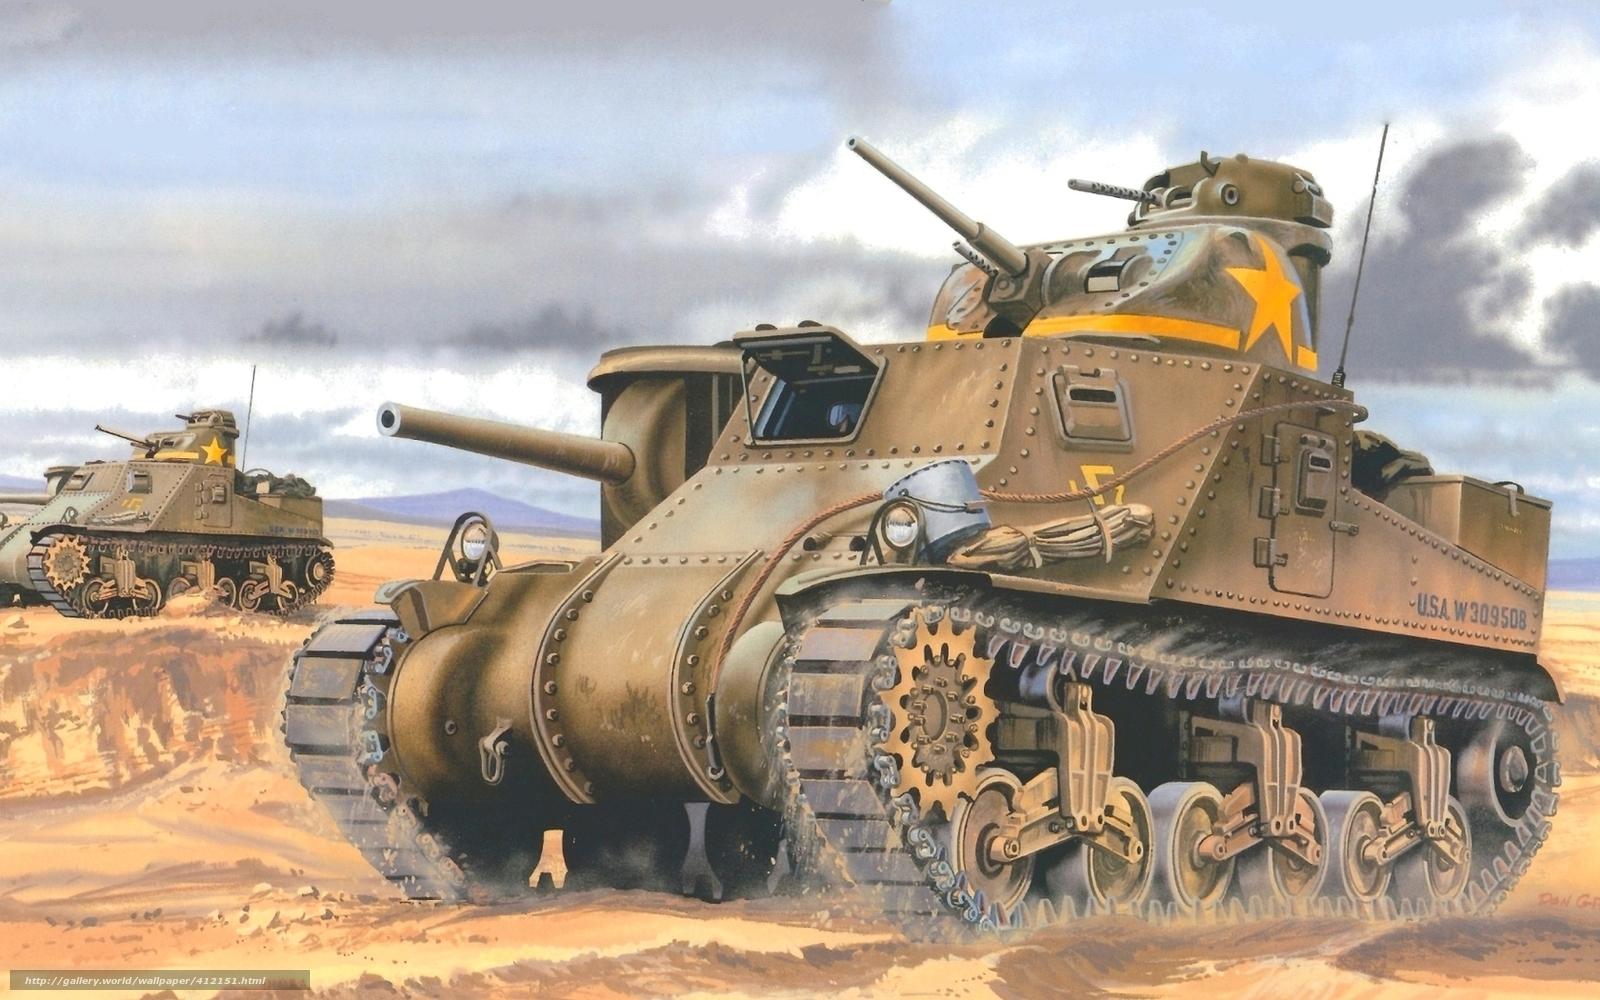 Fond d'ecran dessin, medium tank, usa, la seconde guerre mondiale